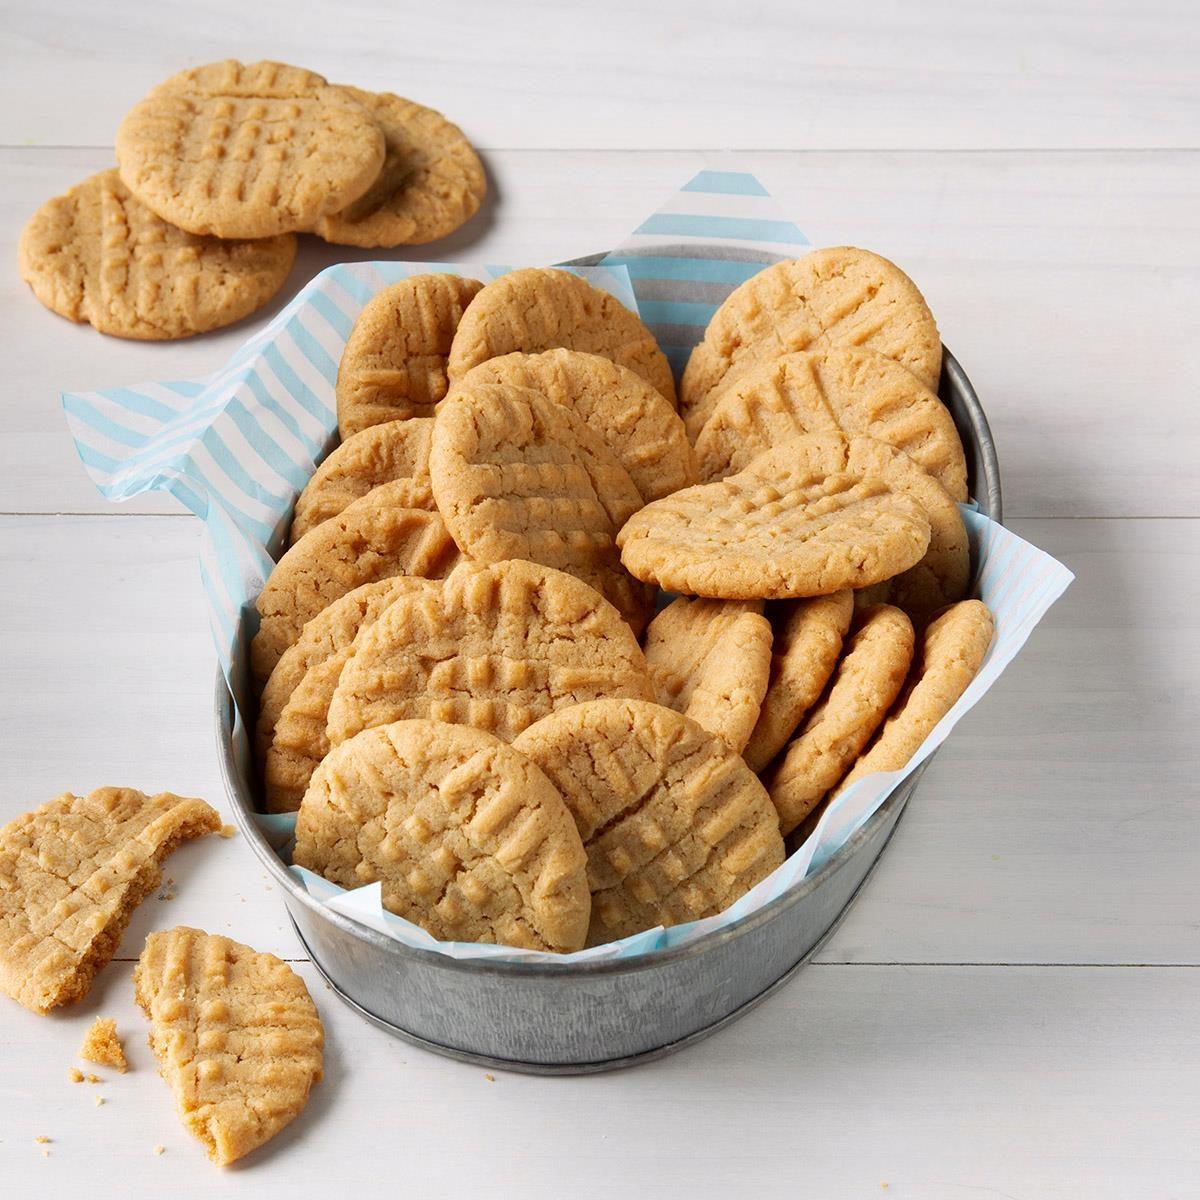 Utah: Honey-Peanut Butter Cookies